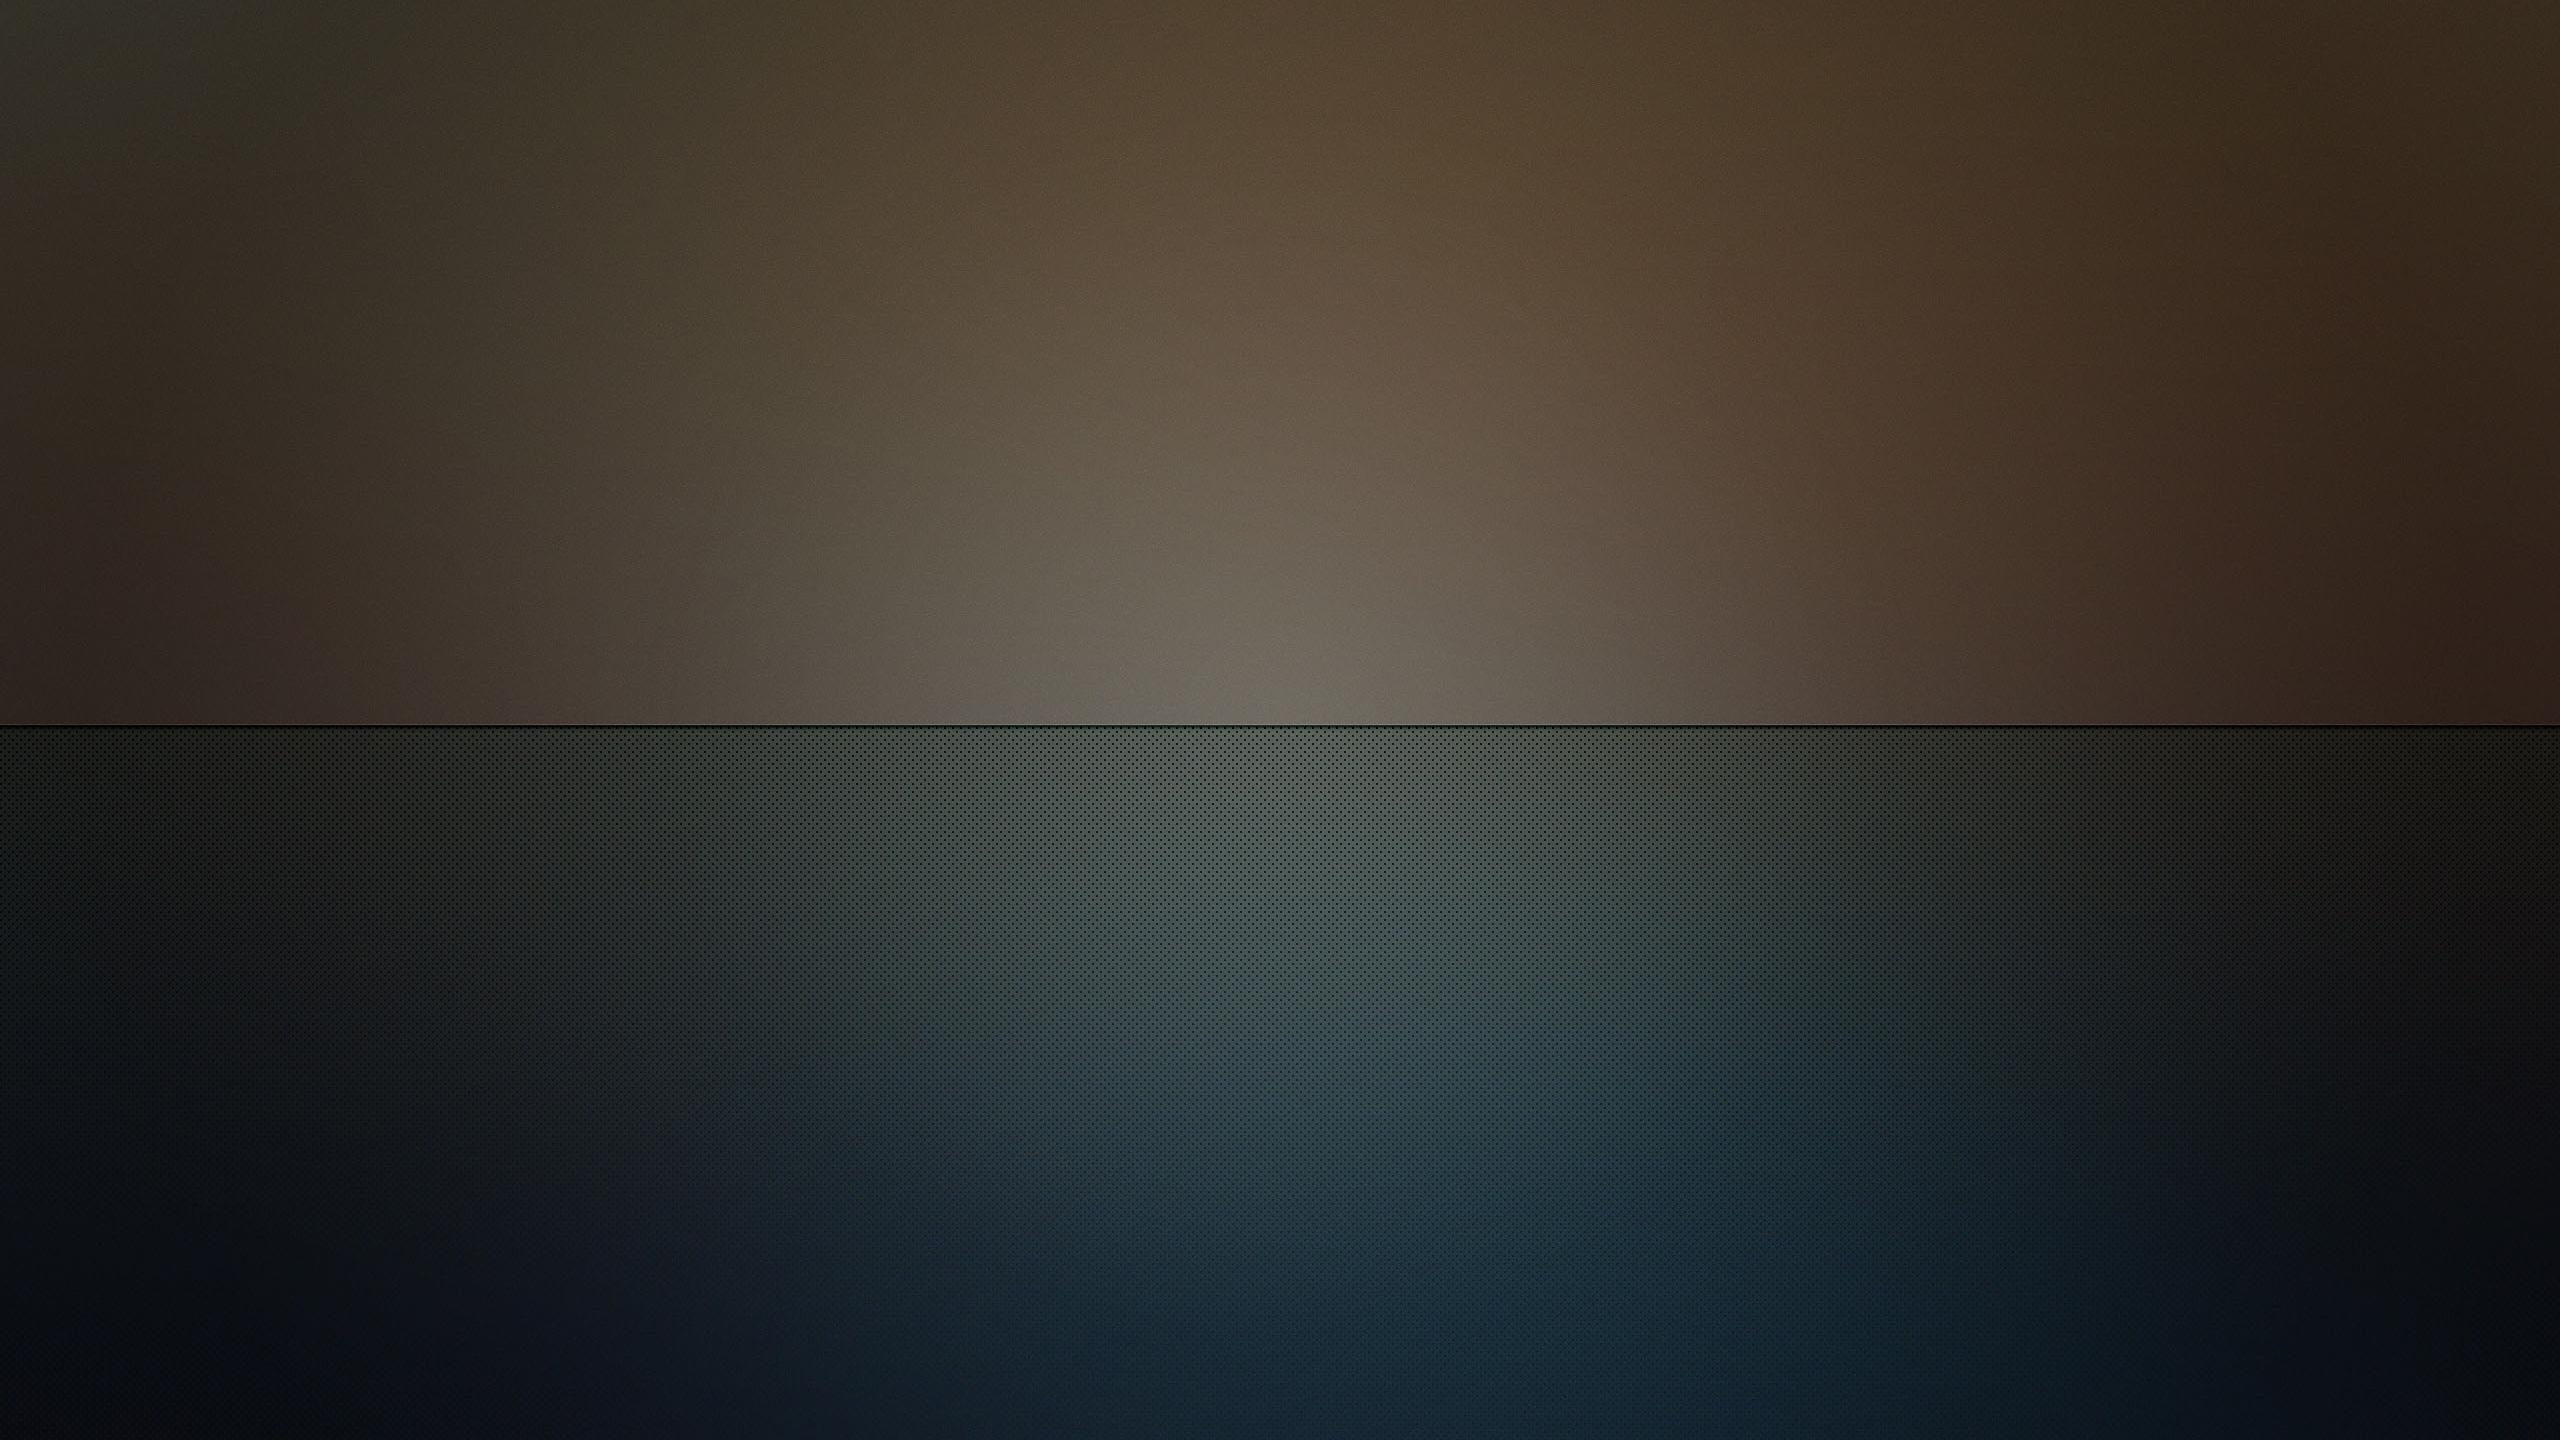 Hd Backgrounds Minimalist 2560x1440 Wallpaper Teahub Io